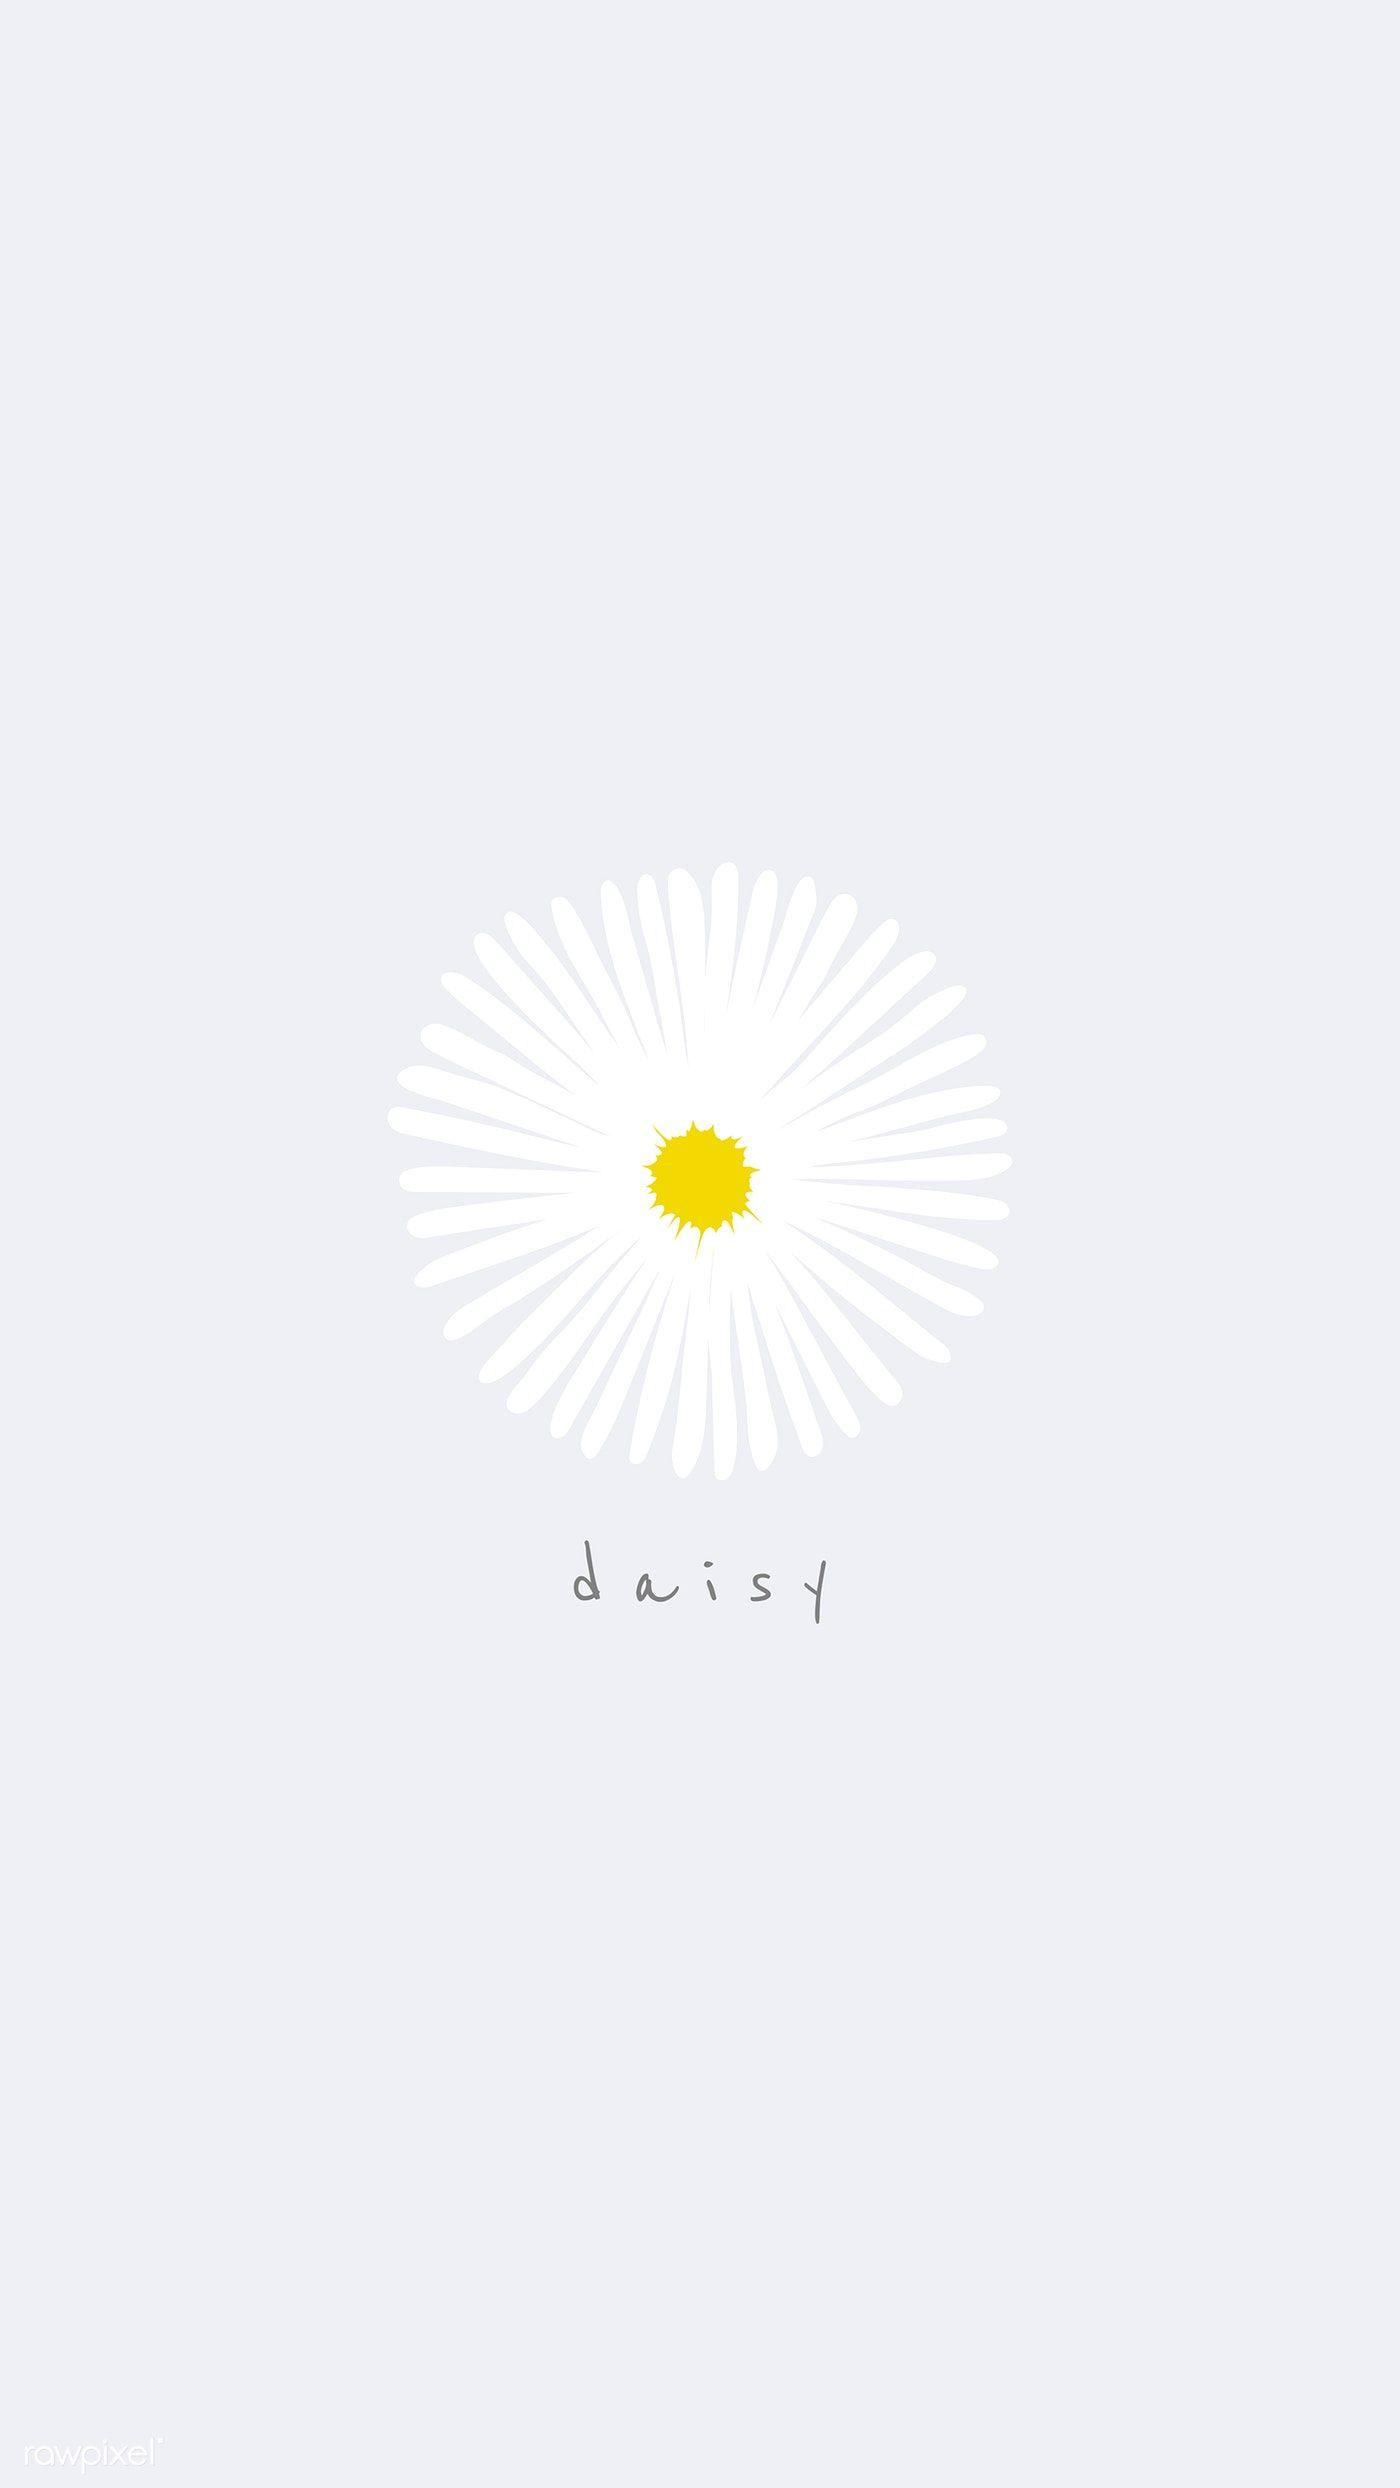 Download Premium Vector Of White Daisy Flower Mobile Wallpaper Vector Cute Flower Wallpapers Daisy Wallpaper Flower Mobile